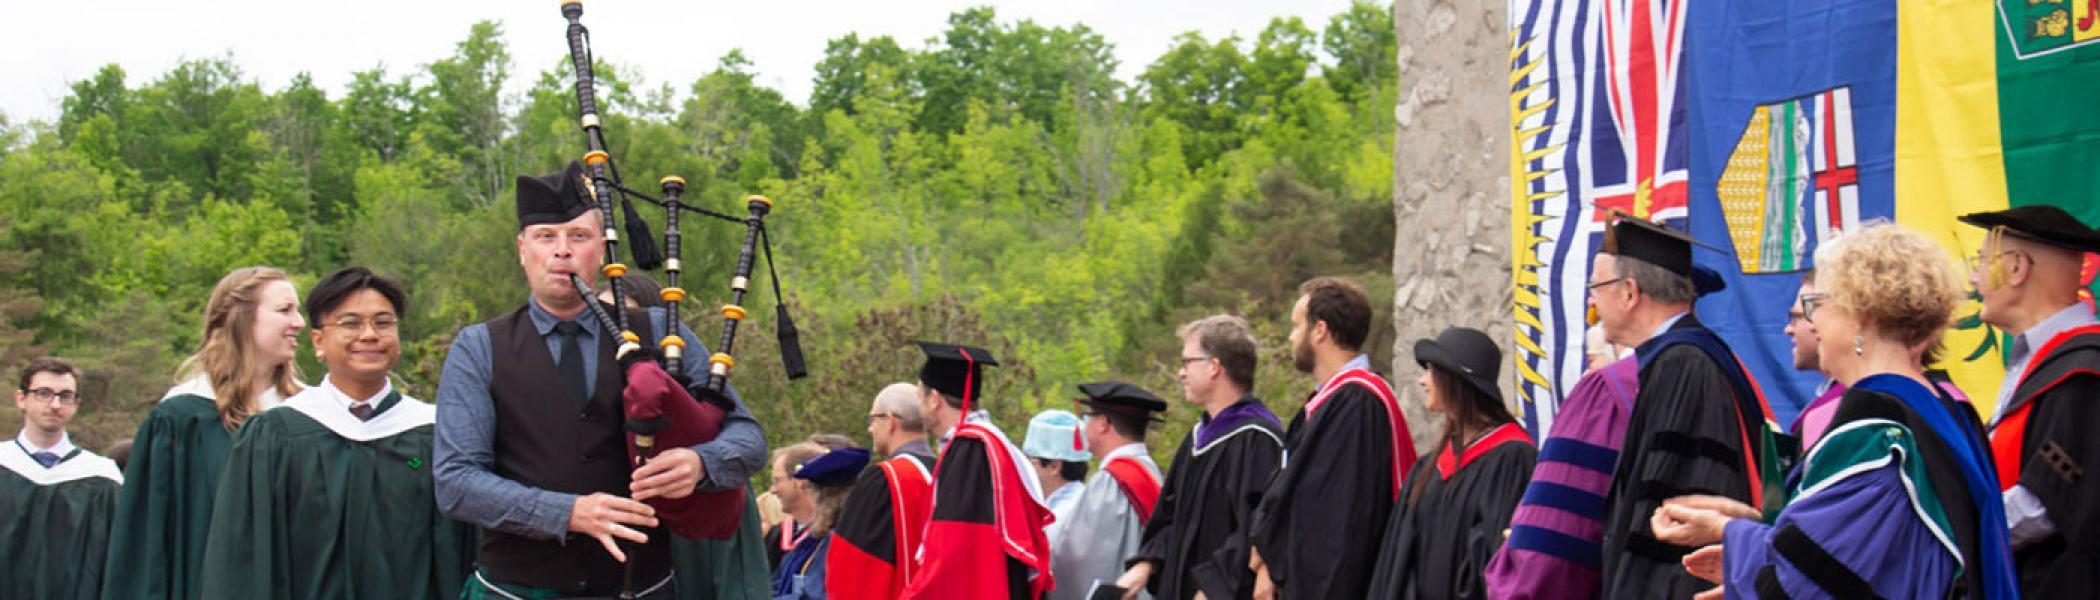 Piper leading the graduates into the convocation ceremony.